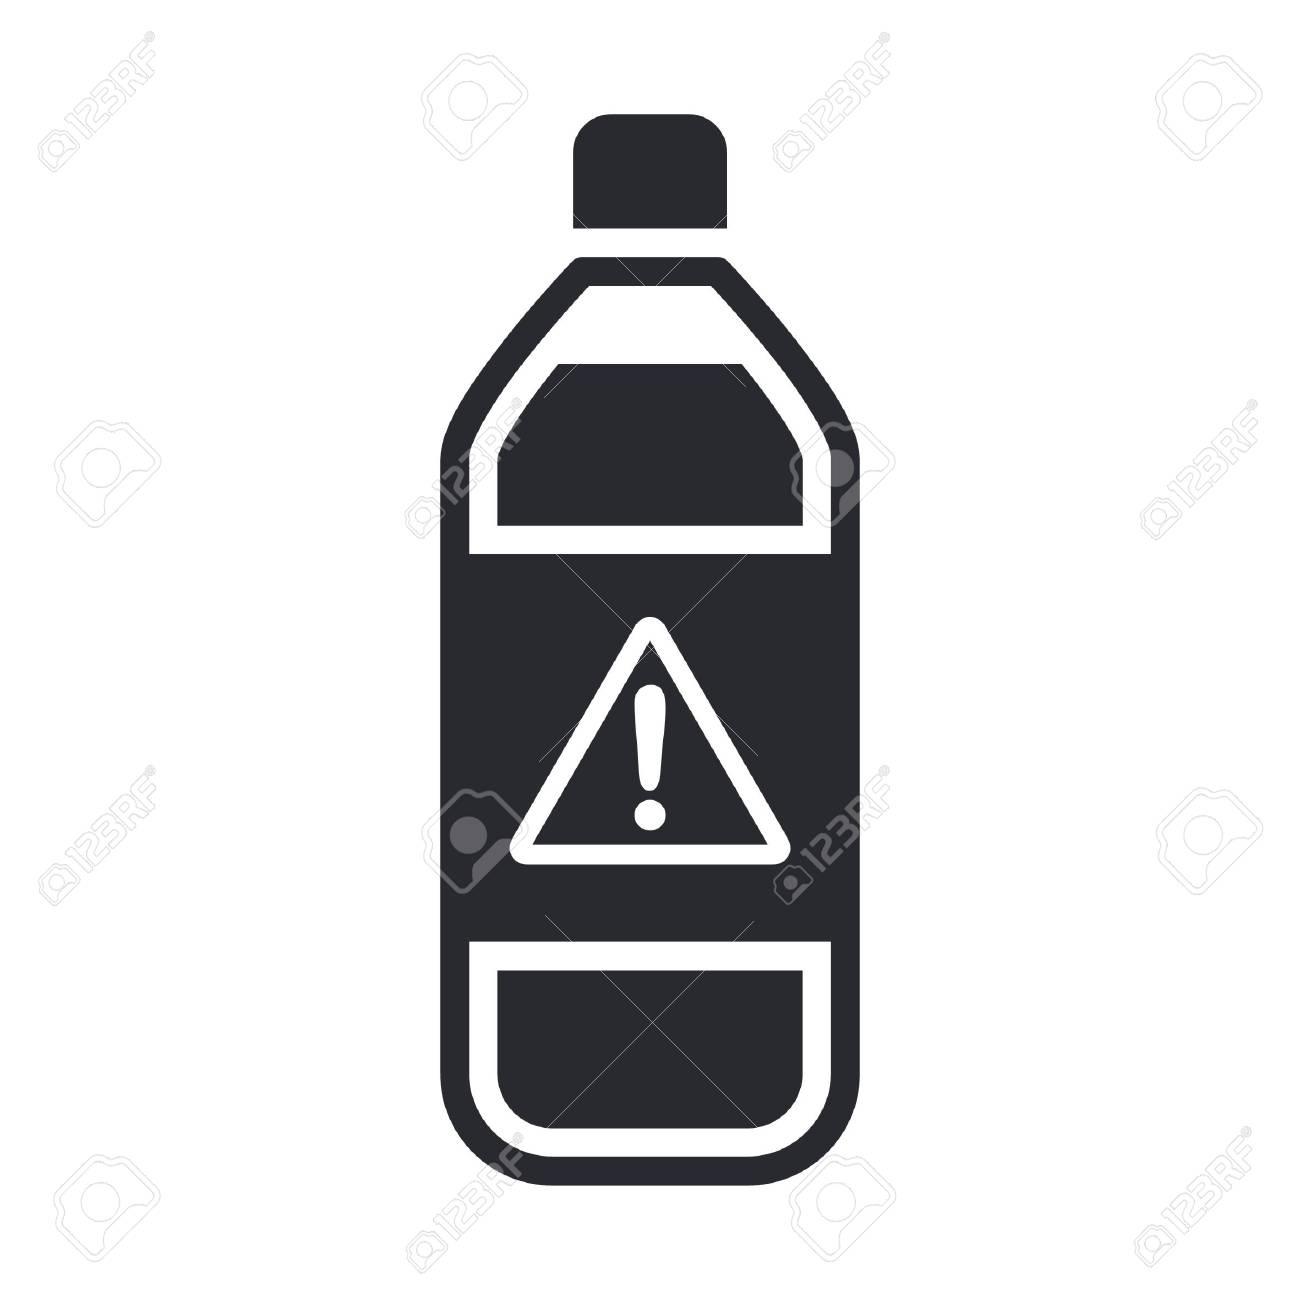 Vector illustration of single isolated dangerous bottle icon Stock Vector - 12119823